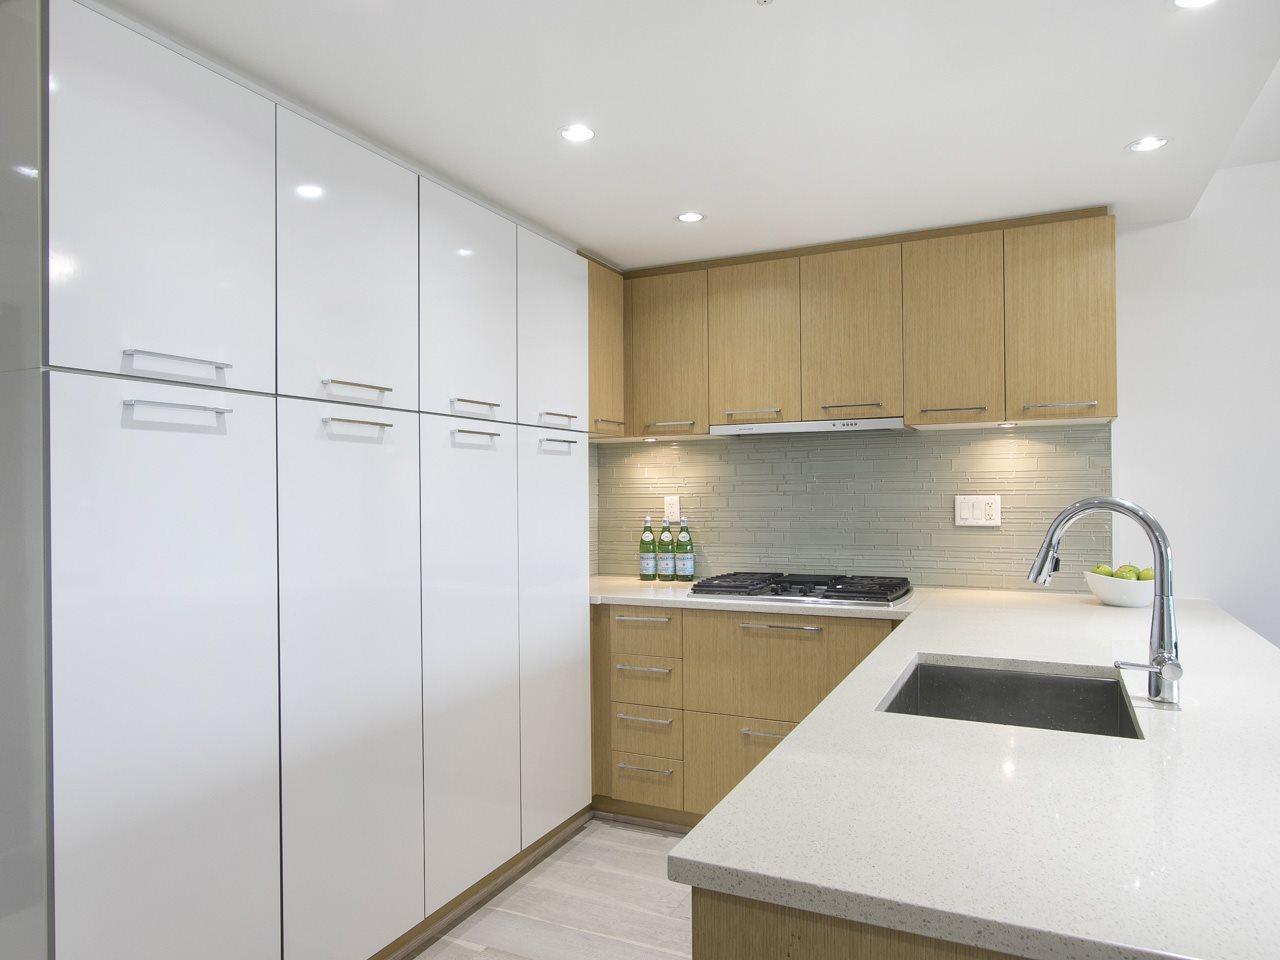 Condo Apartment at 310 1680 W 4TH AVENUE, Unit 310, Vancouver West, British Columbia. Image 12